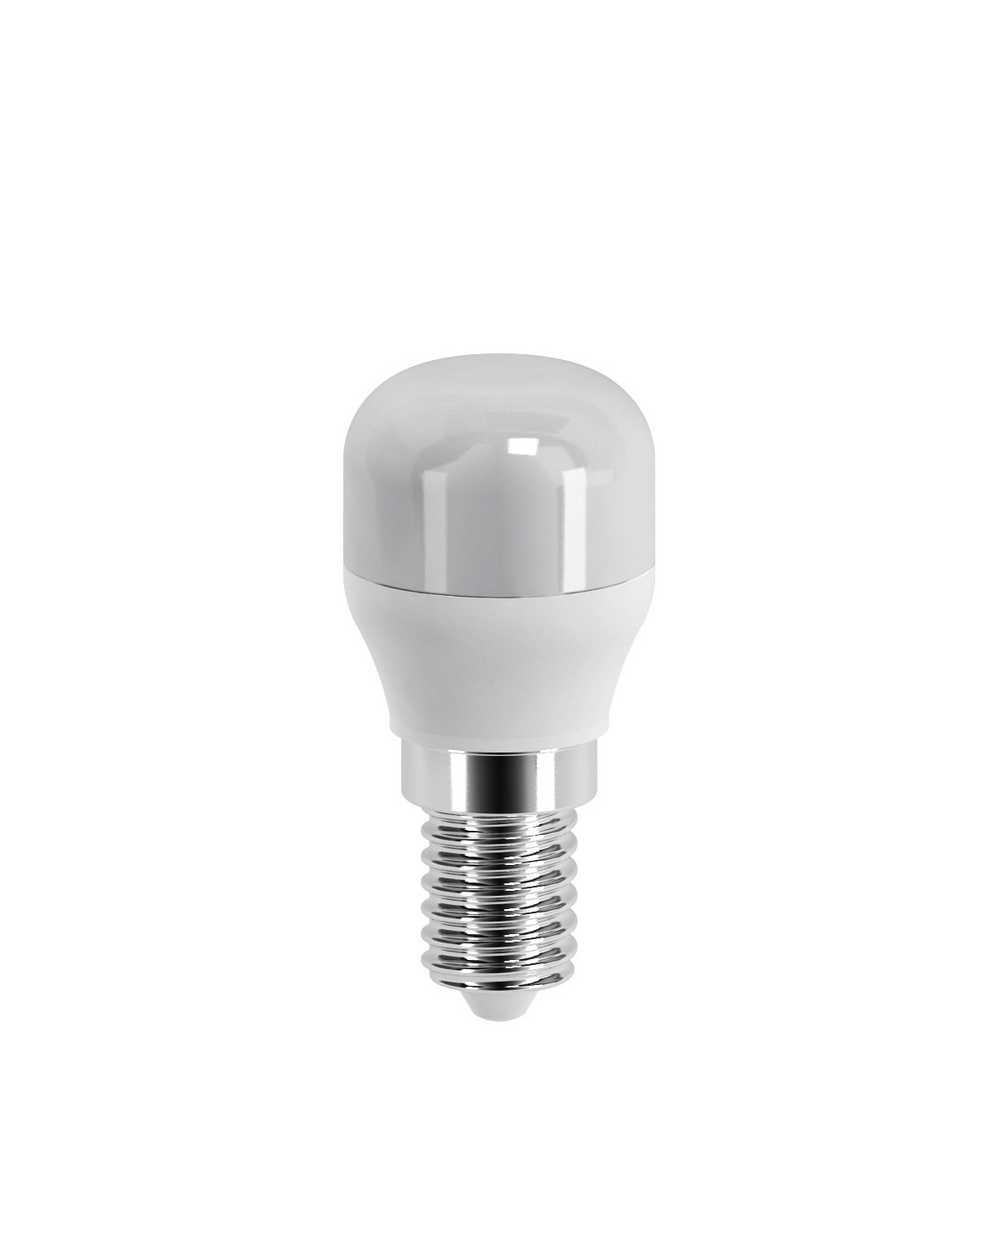 LED LAMP KOELKAST E14 1.5W 110LM